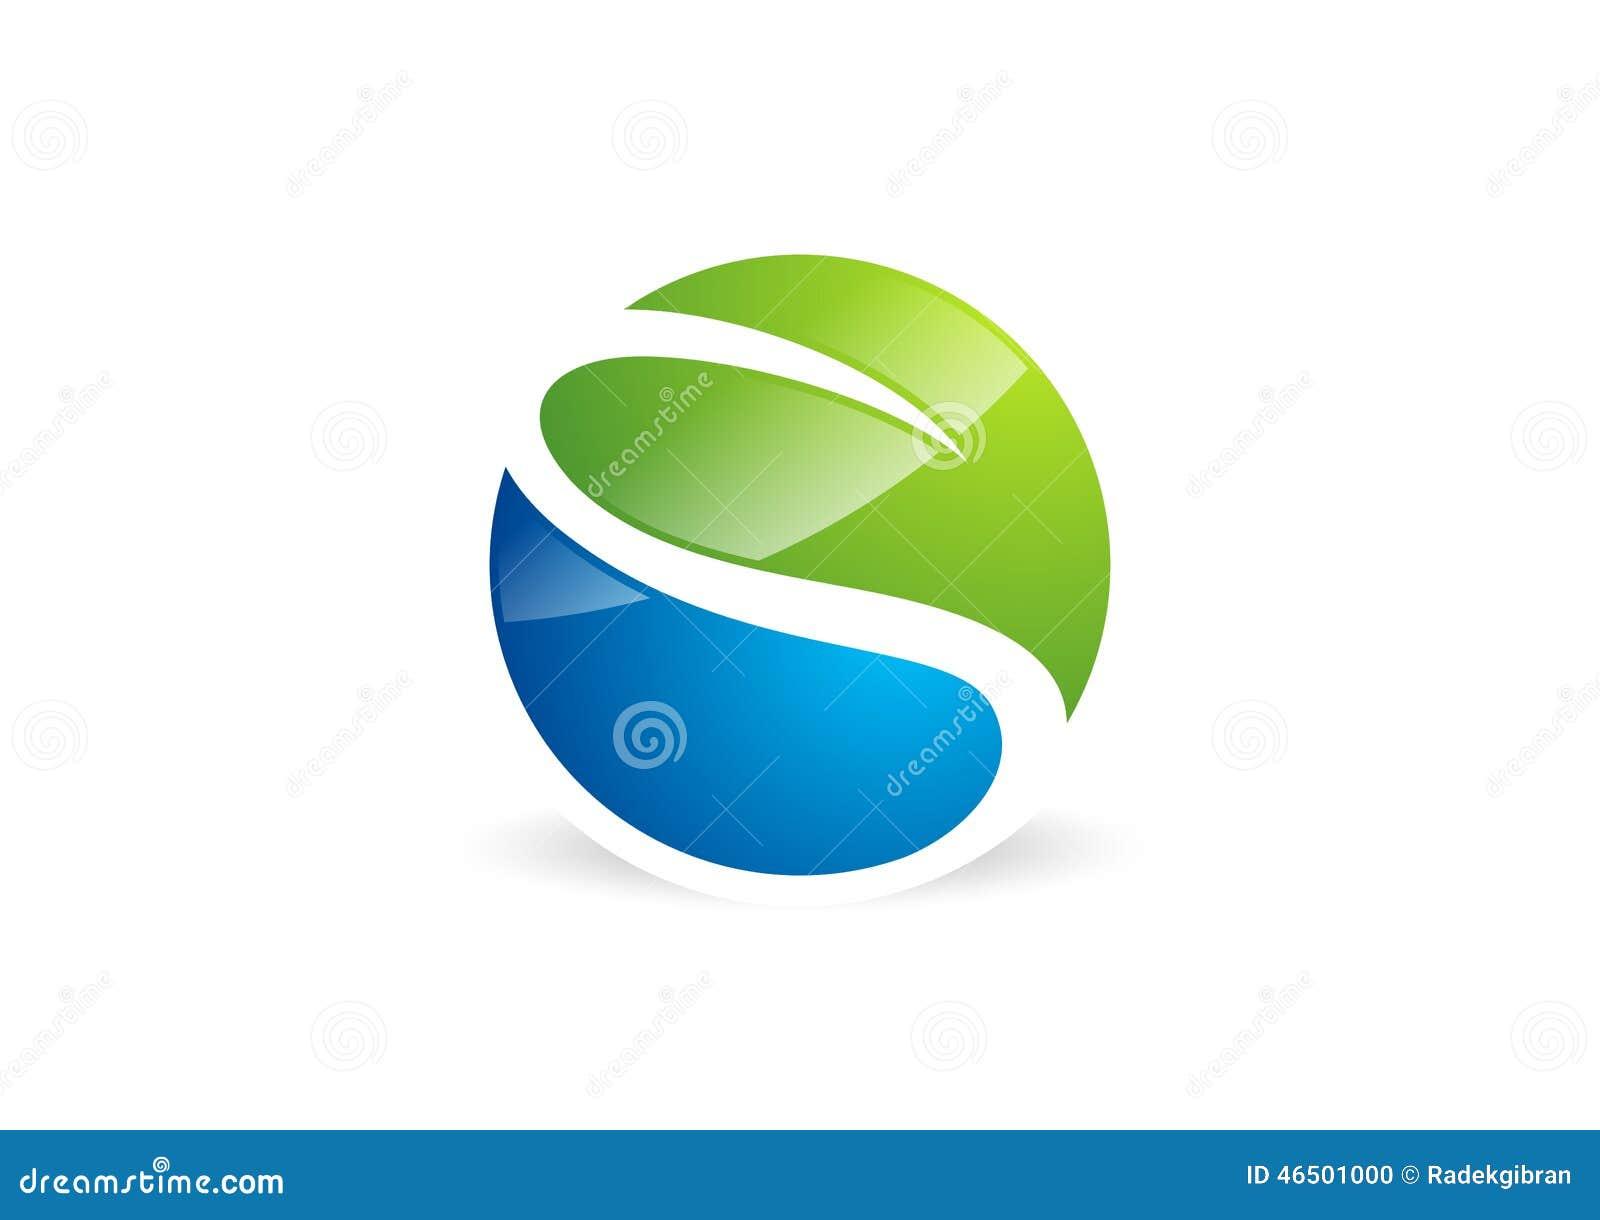 Waterdrop, folha, logotipo, círculo, planta, mola, símbolo da paisagem da natureza, natureza global, ícone da letra s